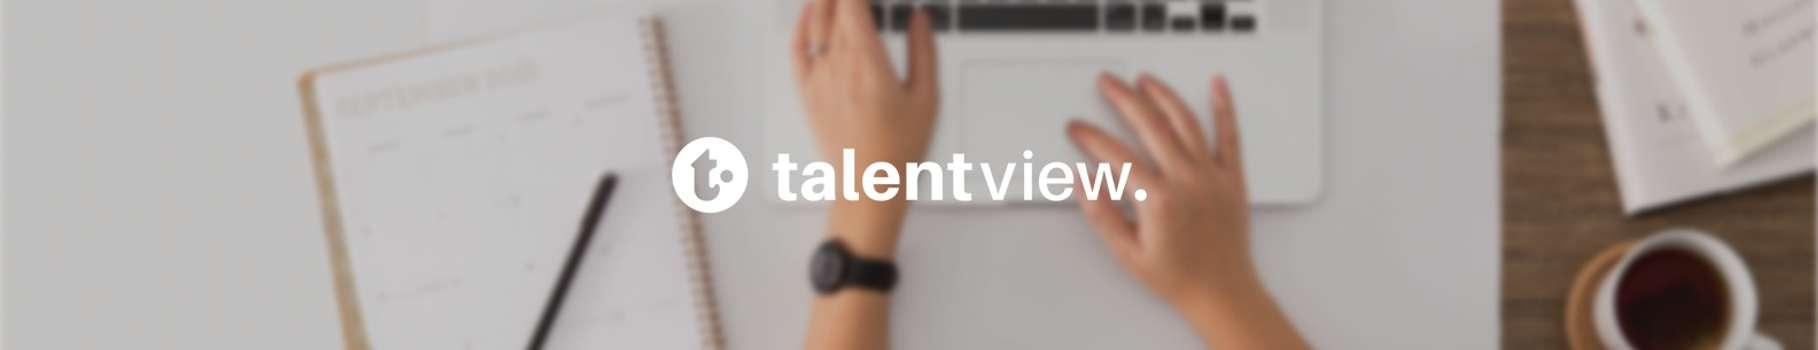 TalentView